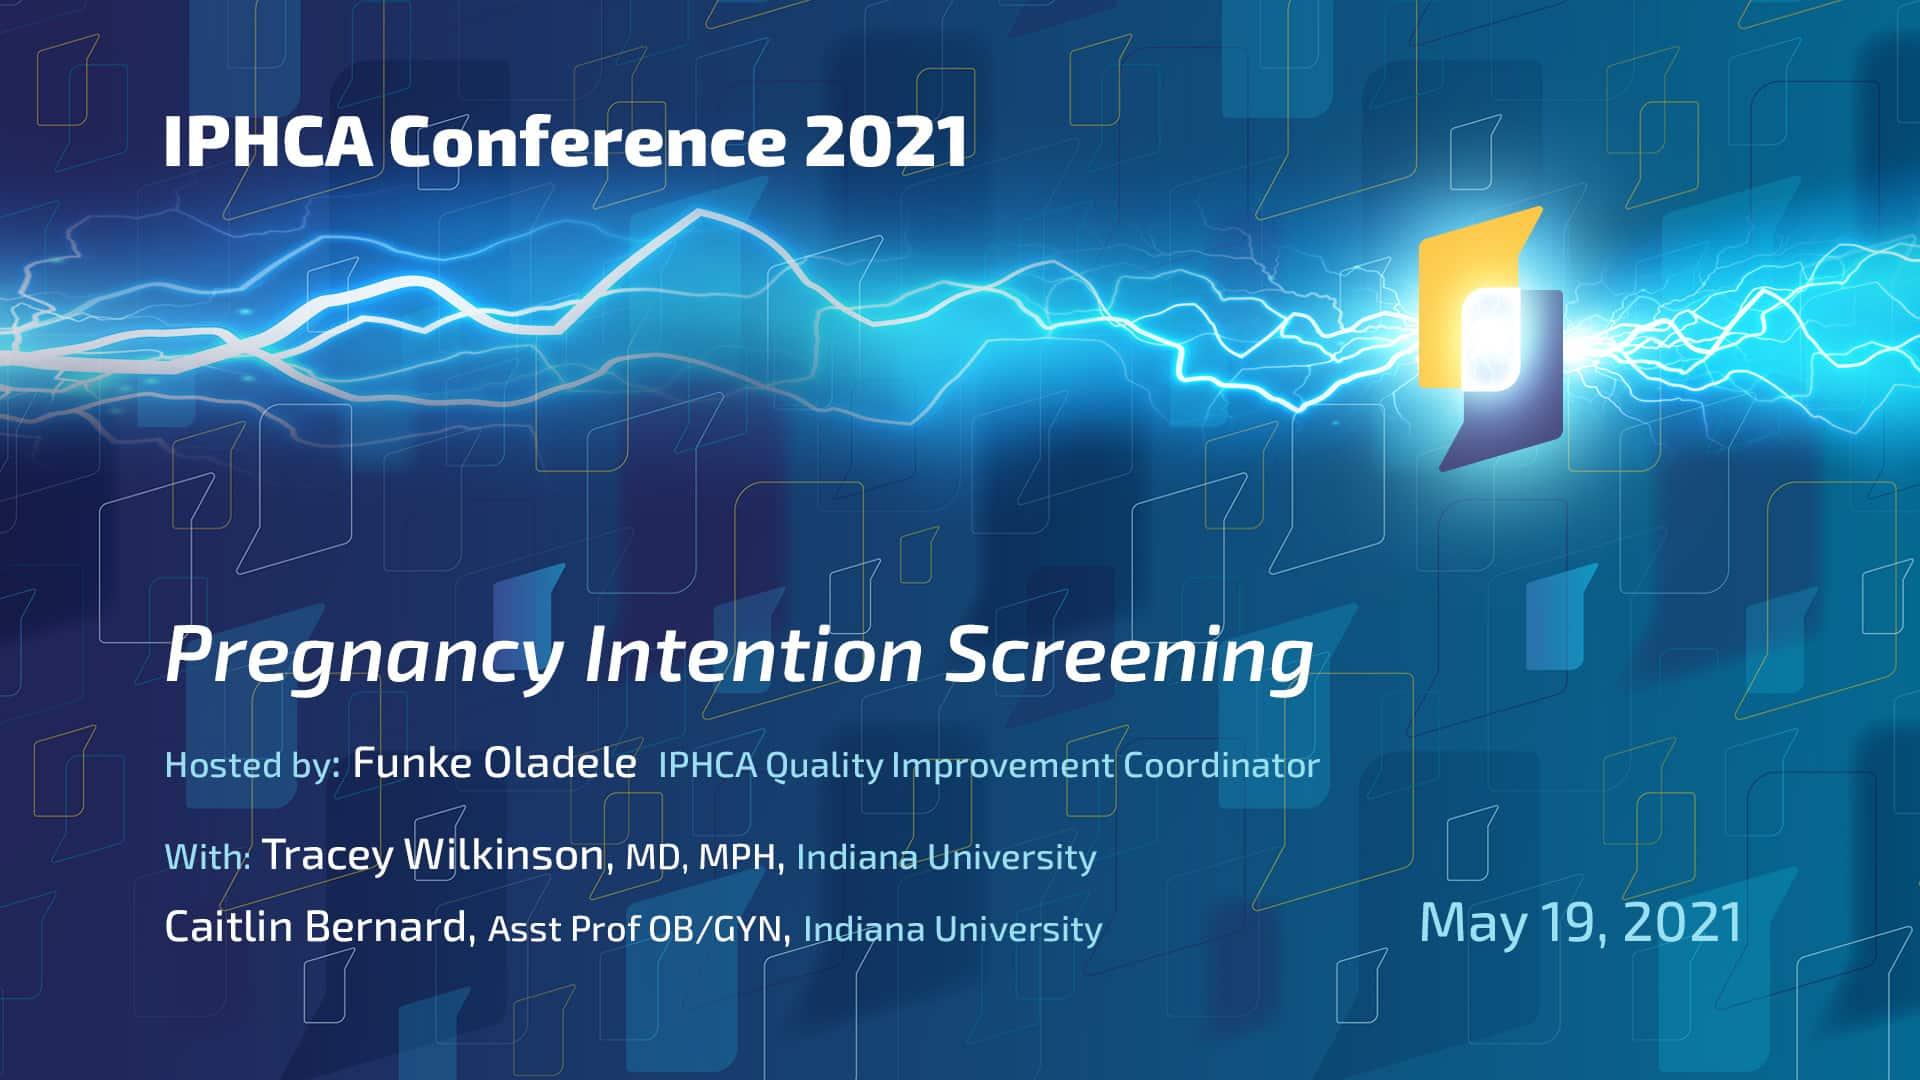 Pregnancy Intention Screening